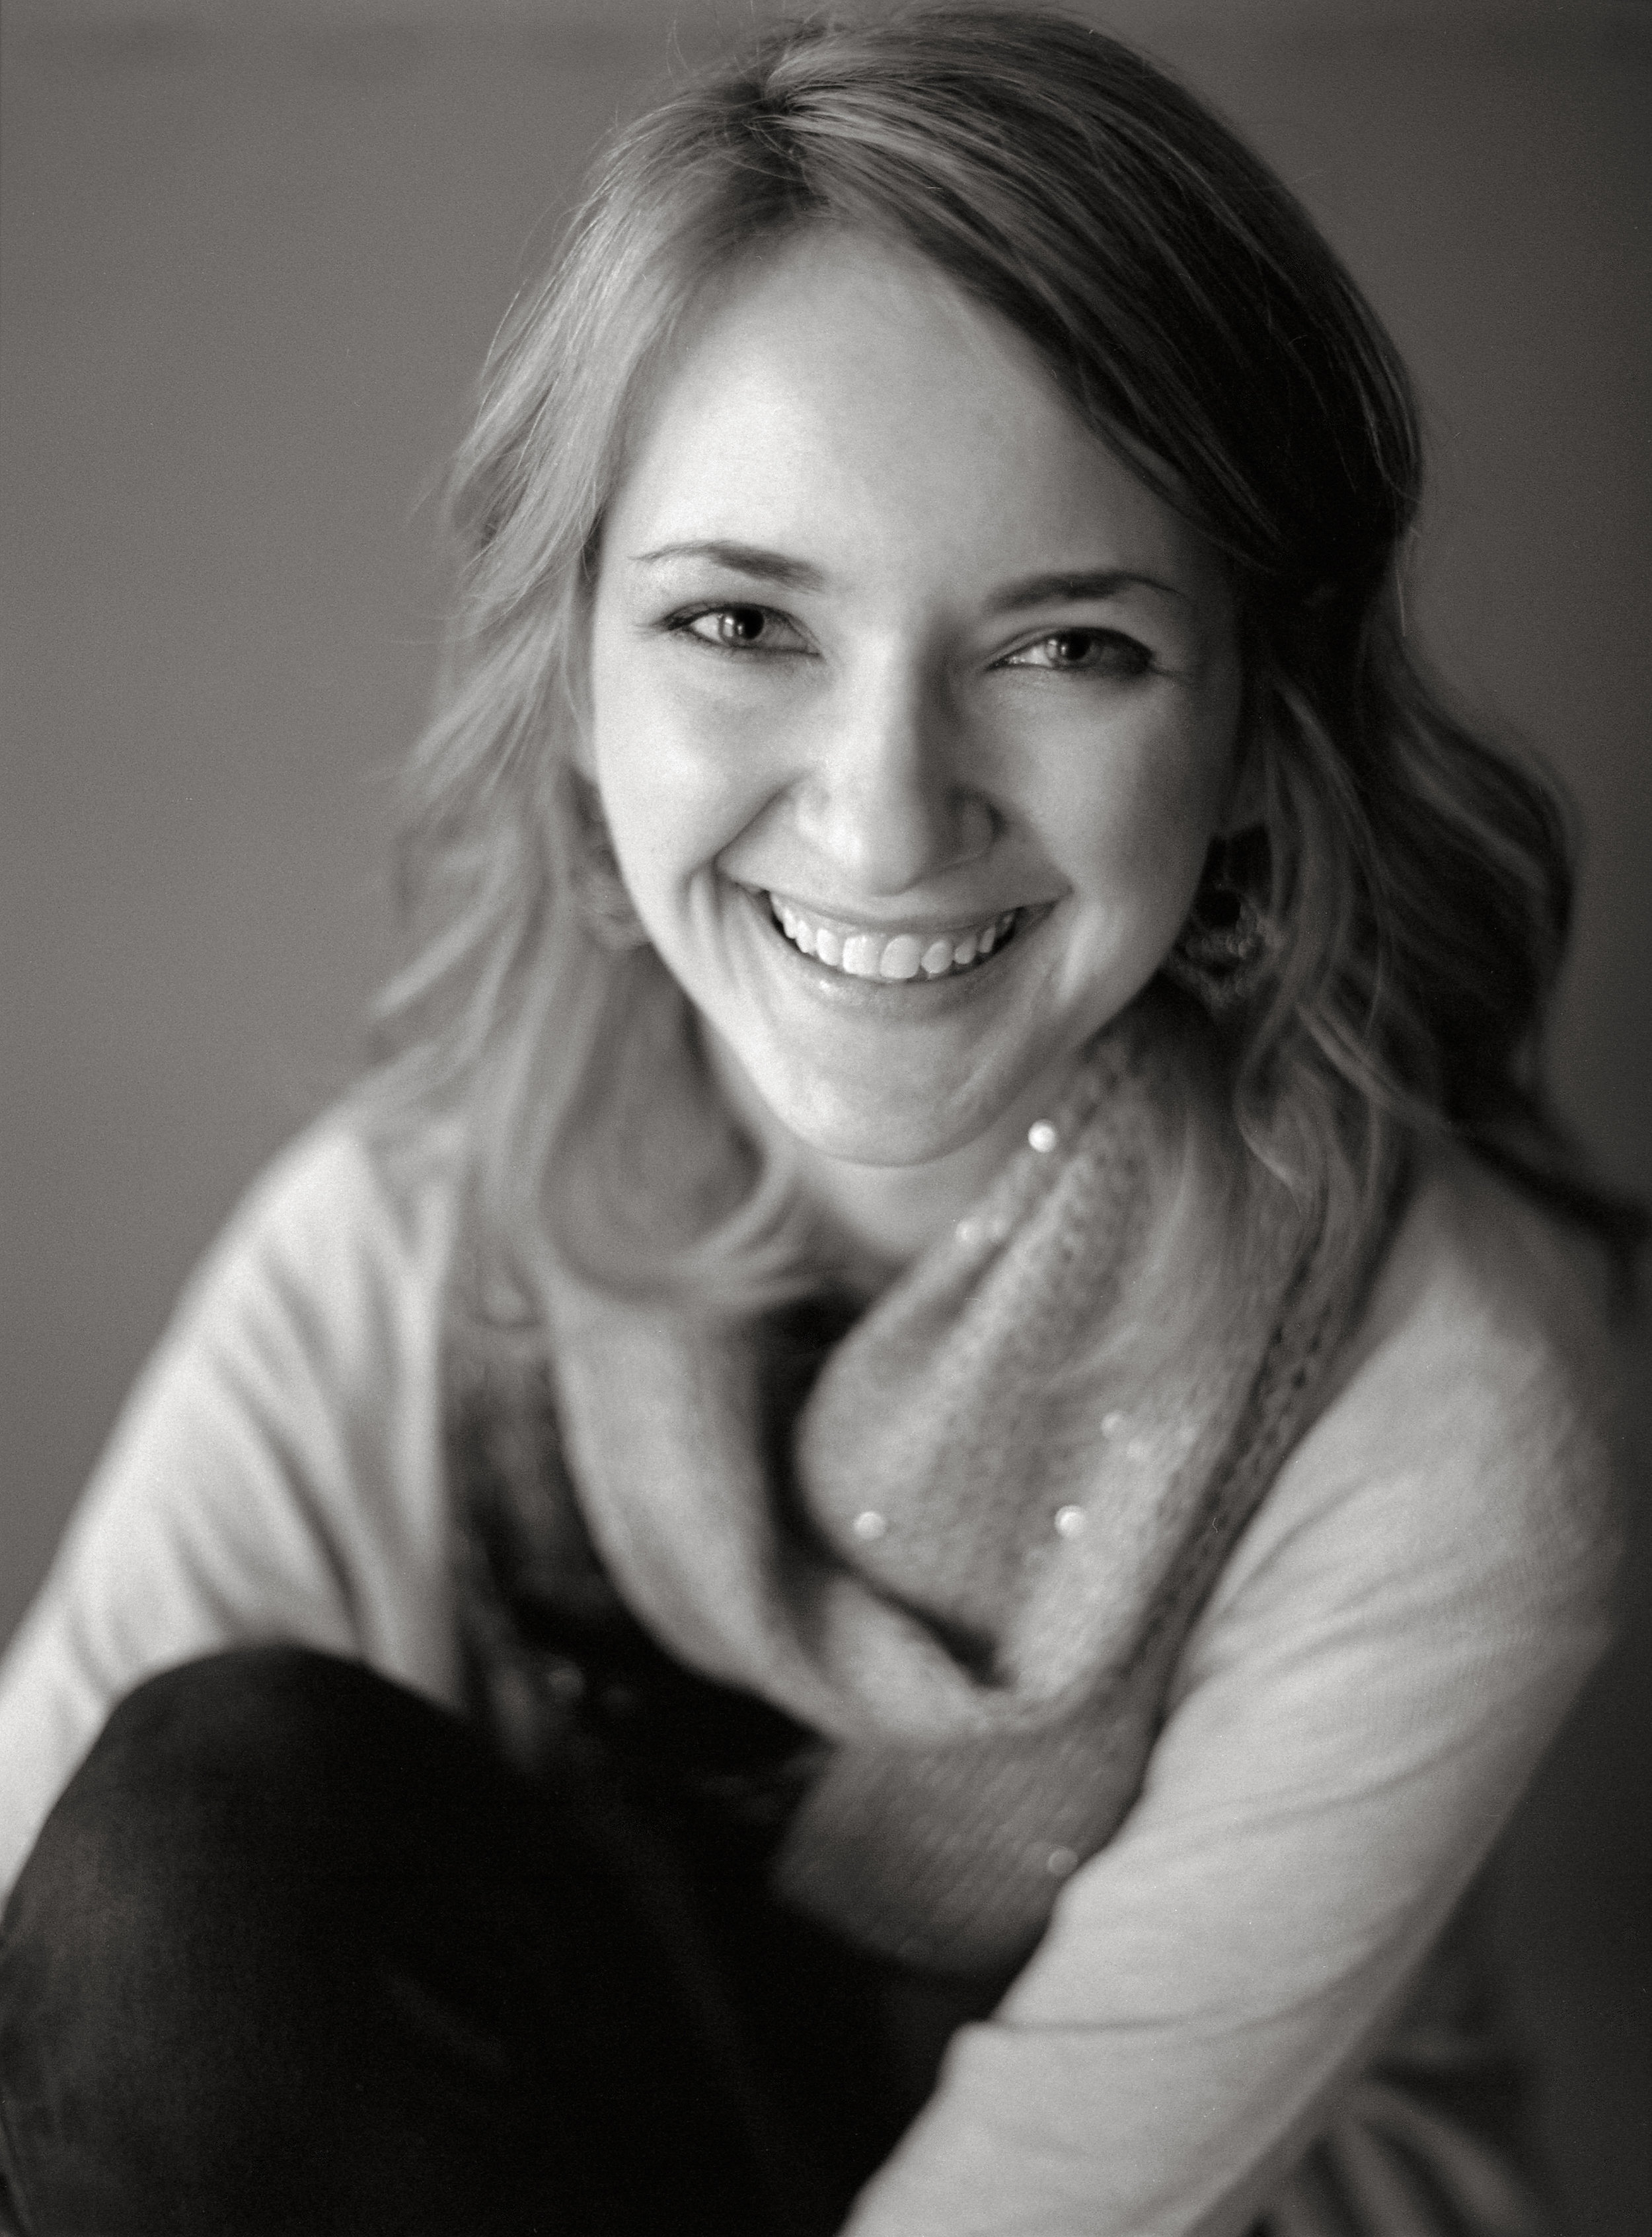 Katie Hartman Curating A Human Library